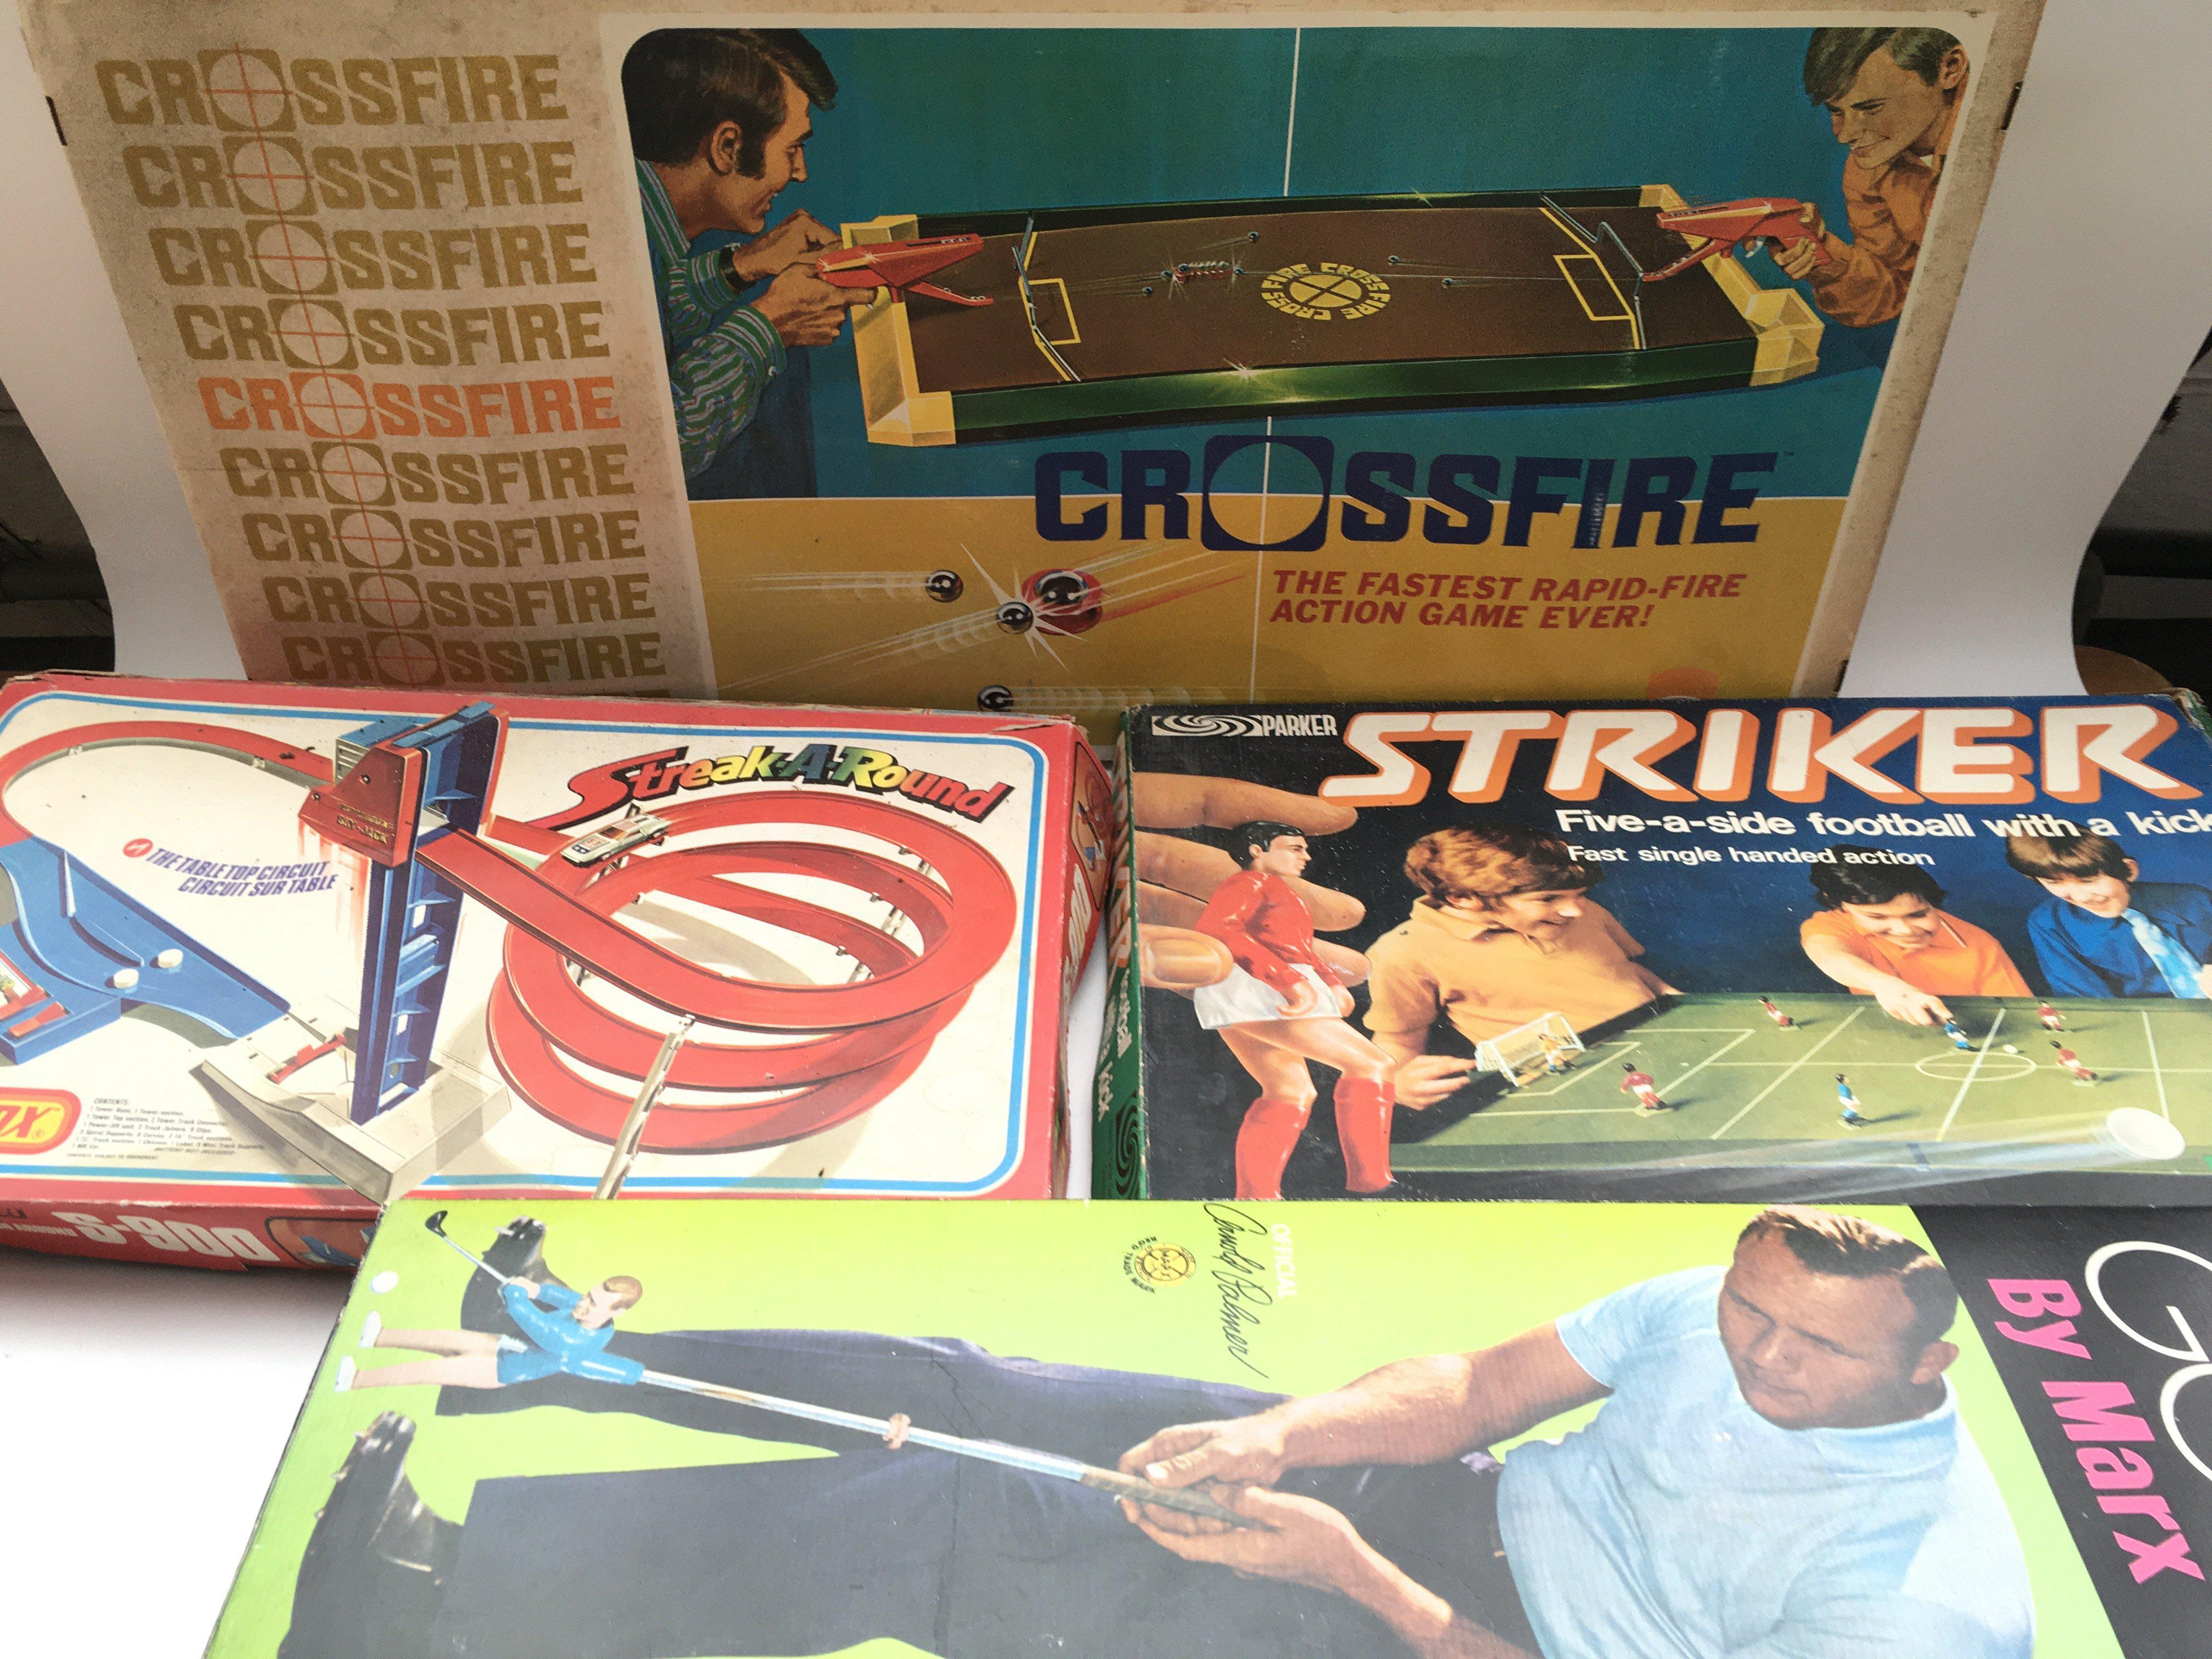 Collection of games including Matchbox. Striker. Arnold Palmer pro golf shot. Crossfire.